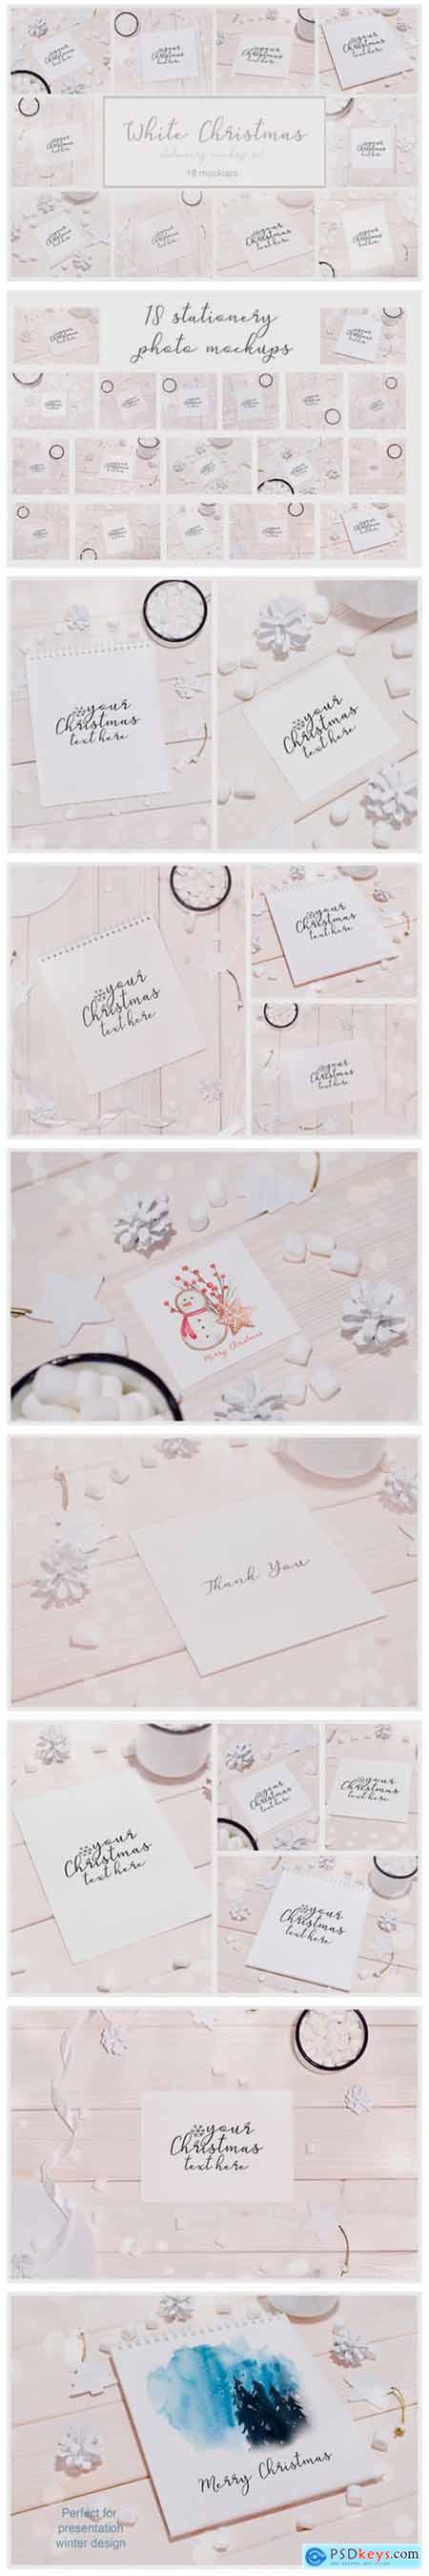 White Christmas 18 Stationery Mockups 2007381